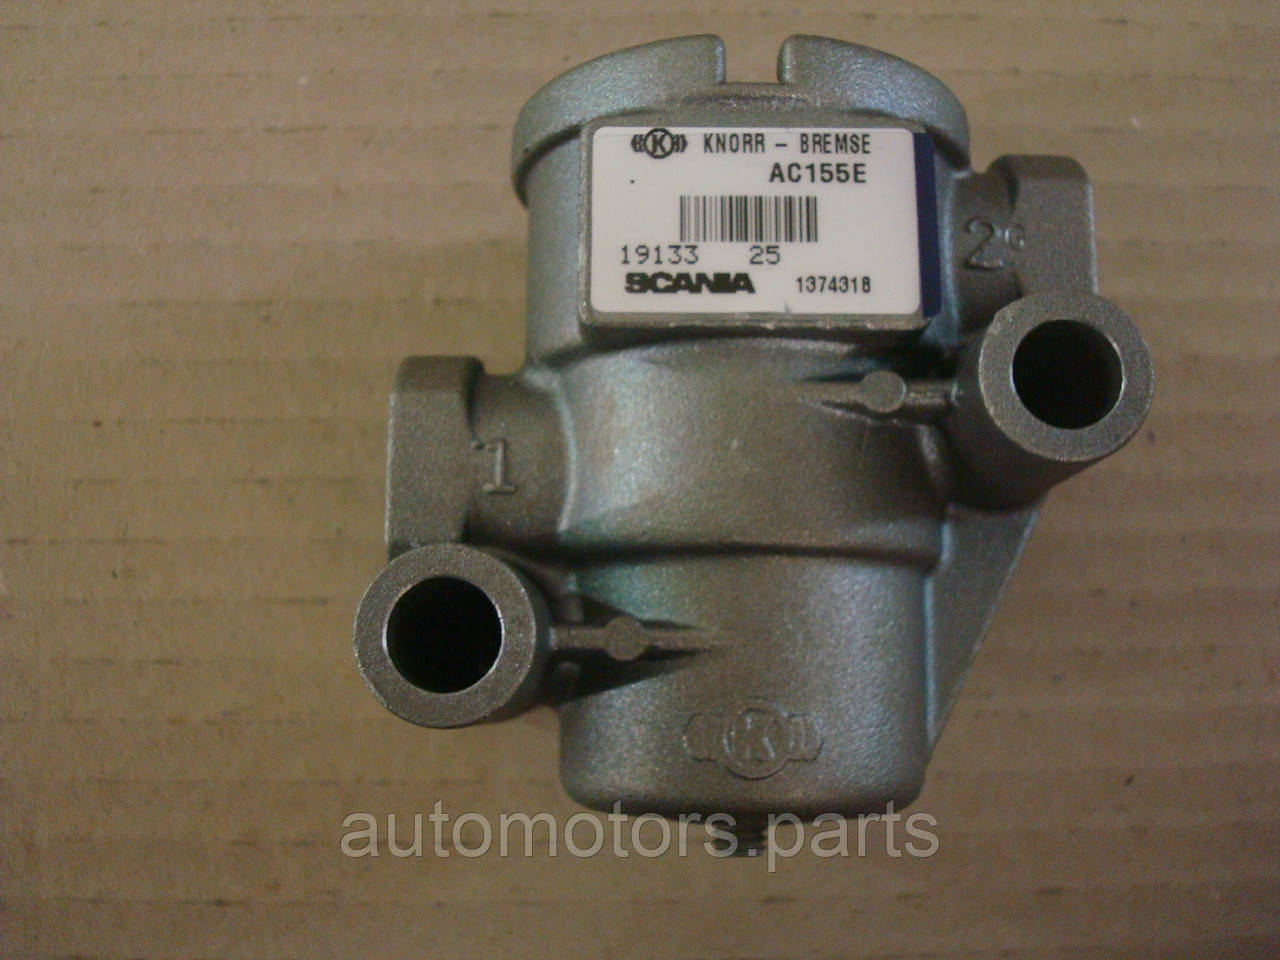 Редукционный клапан AC155E, Knorr-Bremse